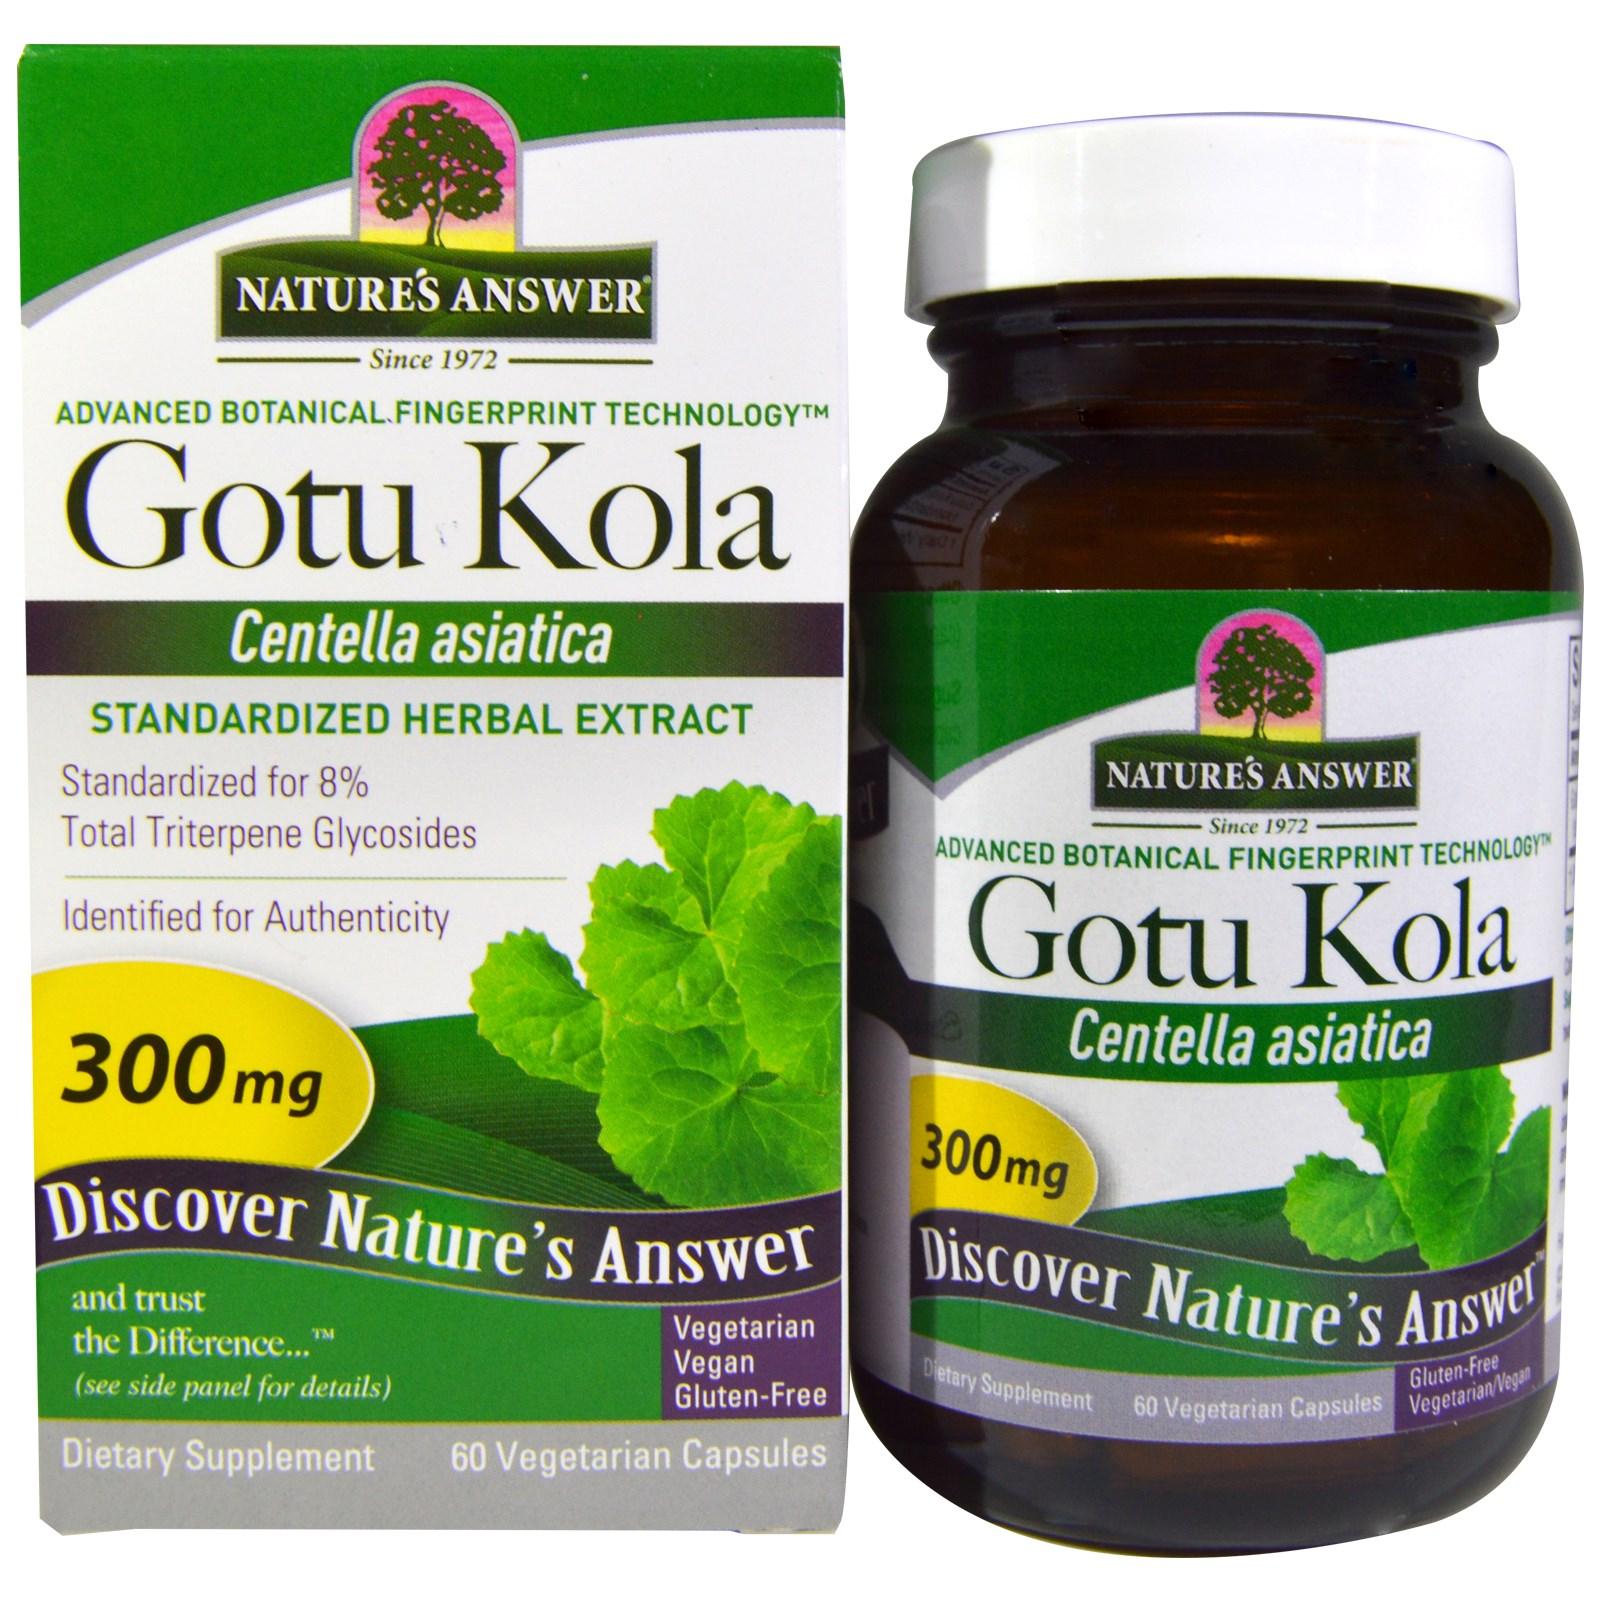 Image of Gotu Kola, Standardized Herbal Extract, 300 mg (60 Veggie Caps) - Nature's Answer 0083000163937